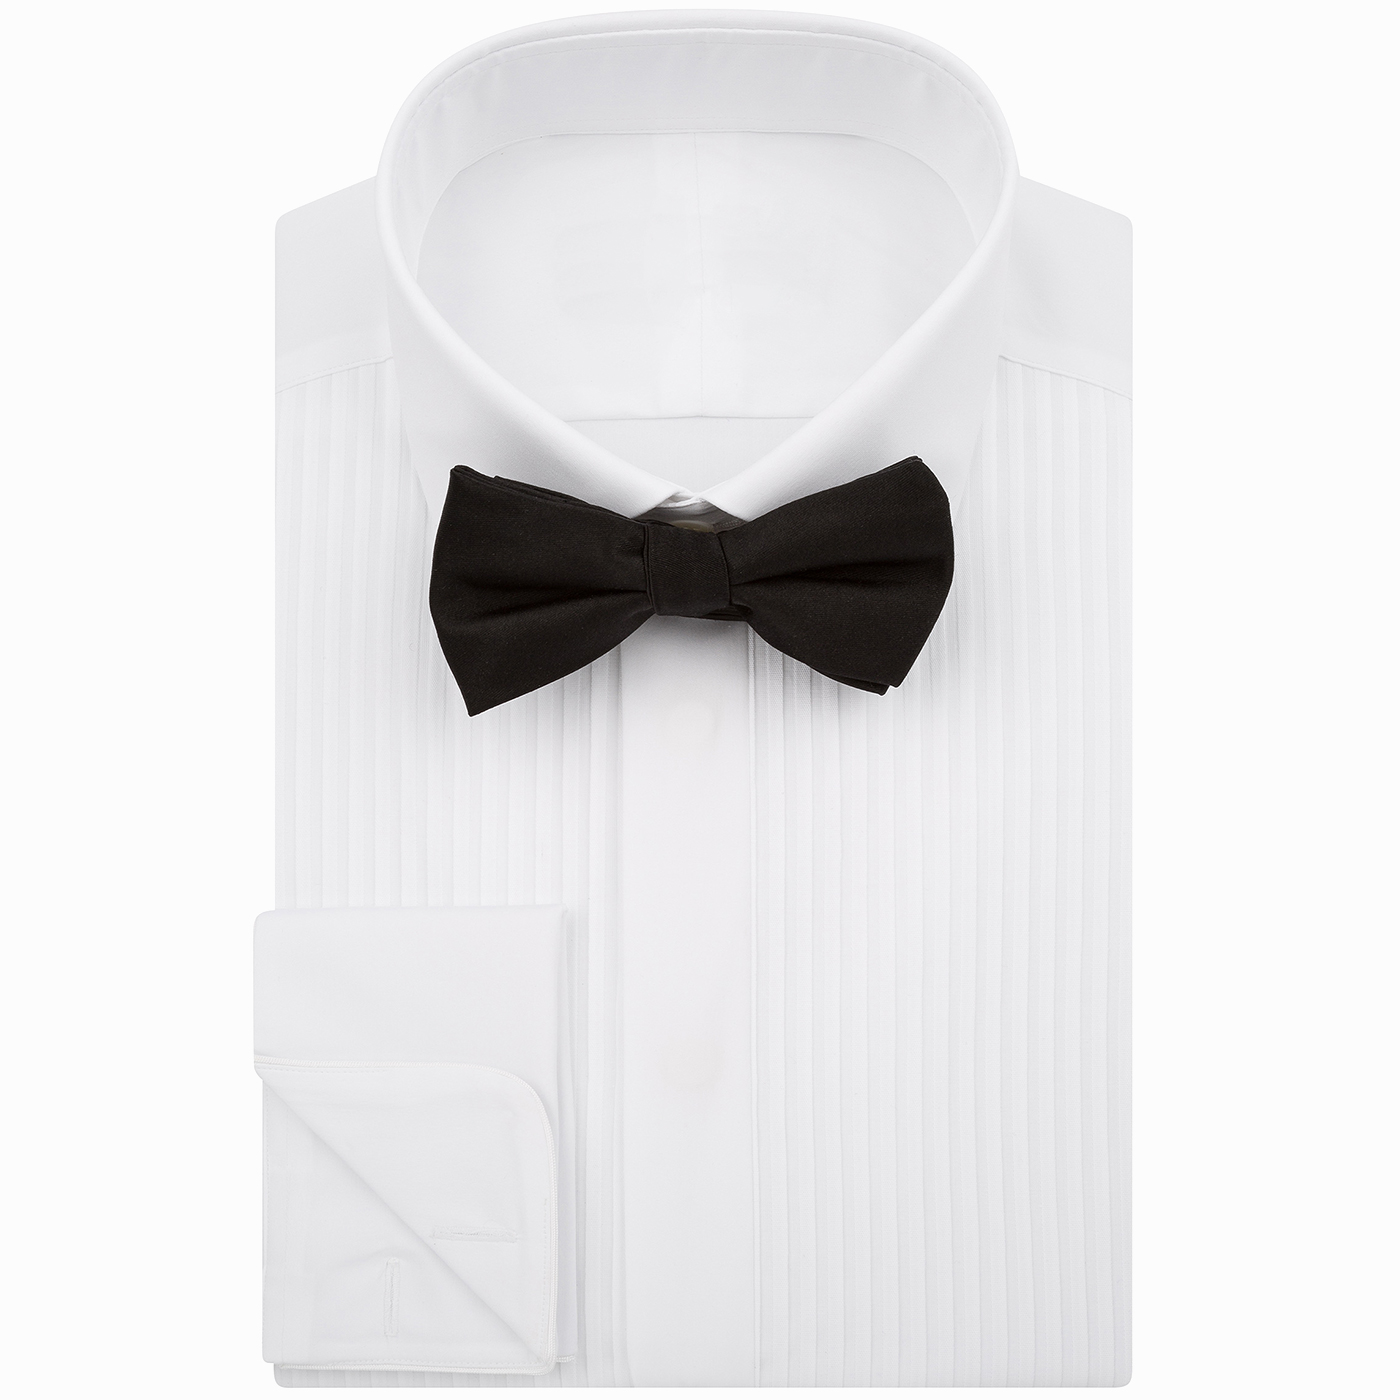 Shirt_10_Dinner-shirt_pleated.jpg